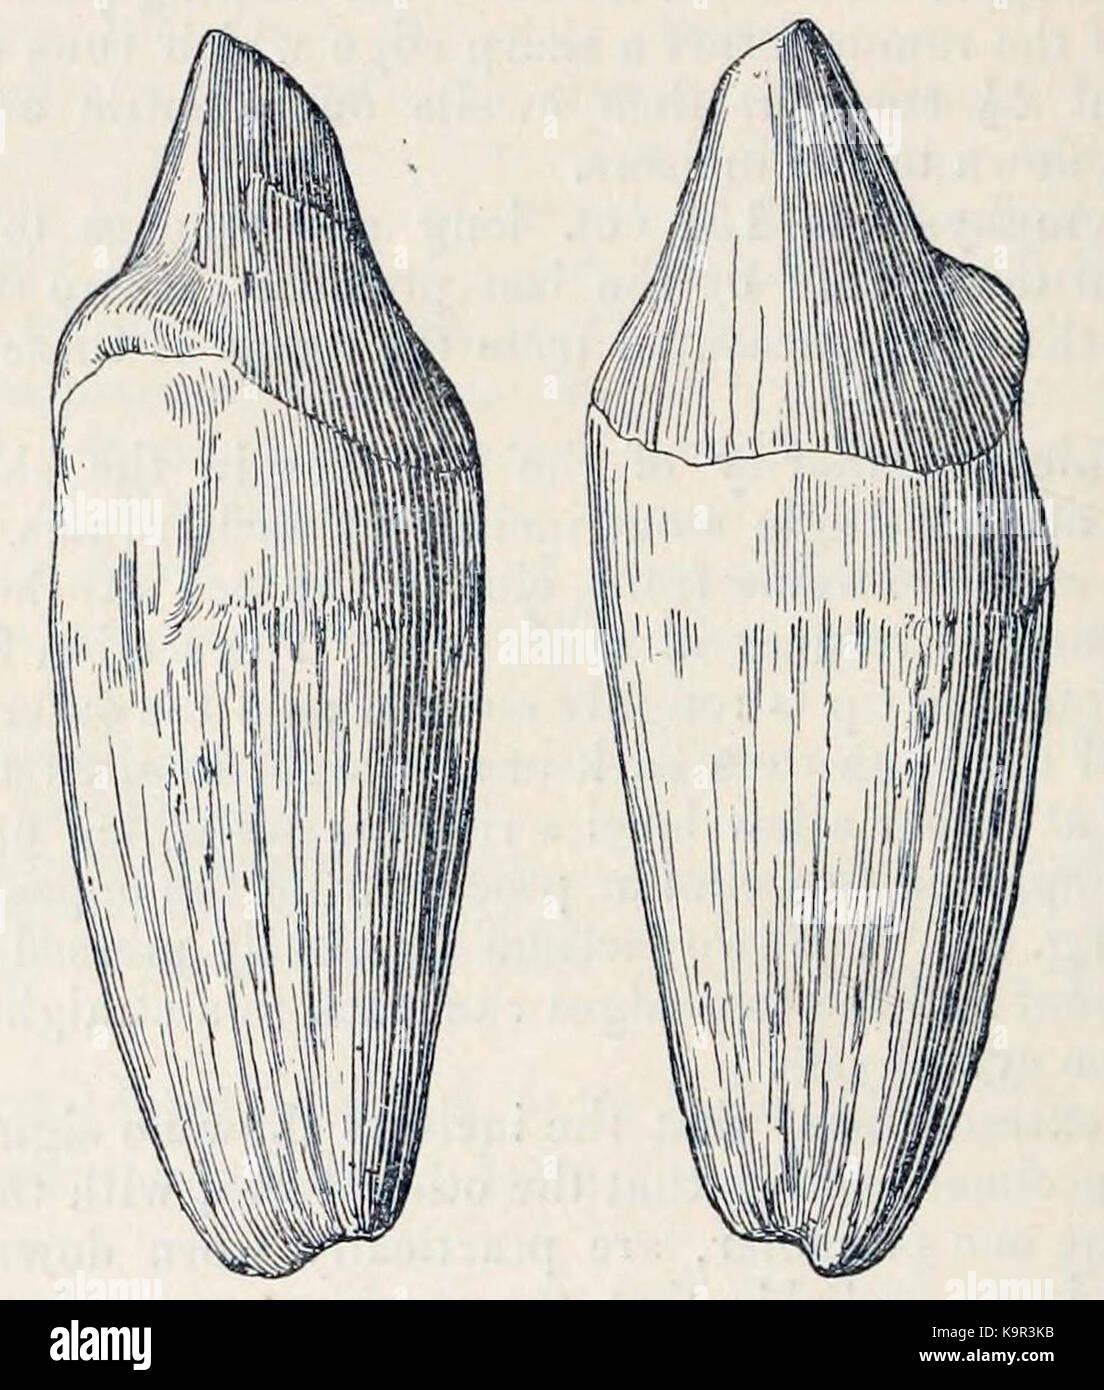 Paraceratherium bugtiense incisors - Stock Image